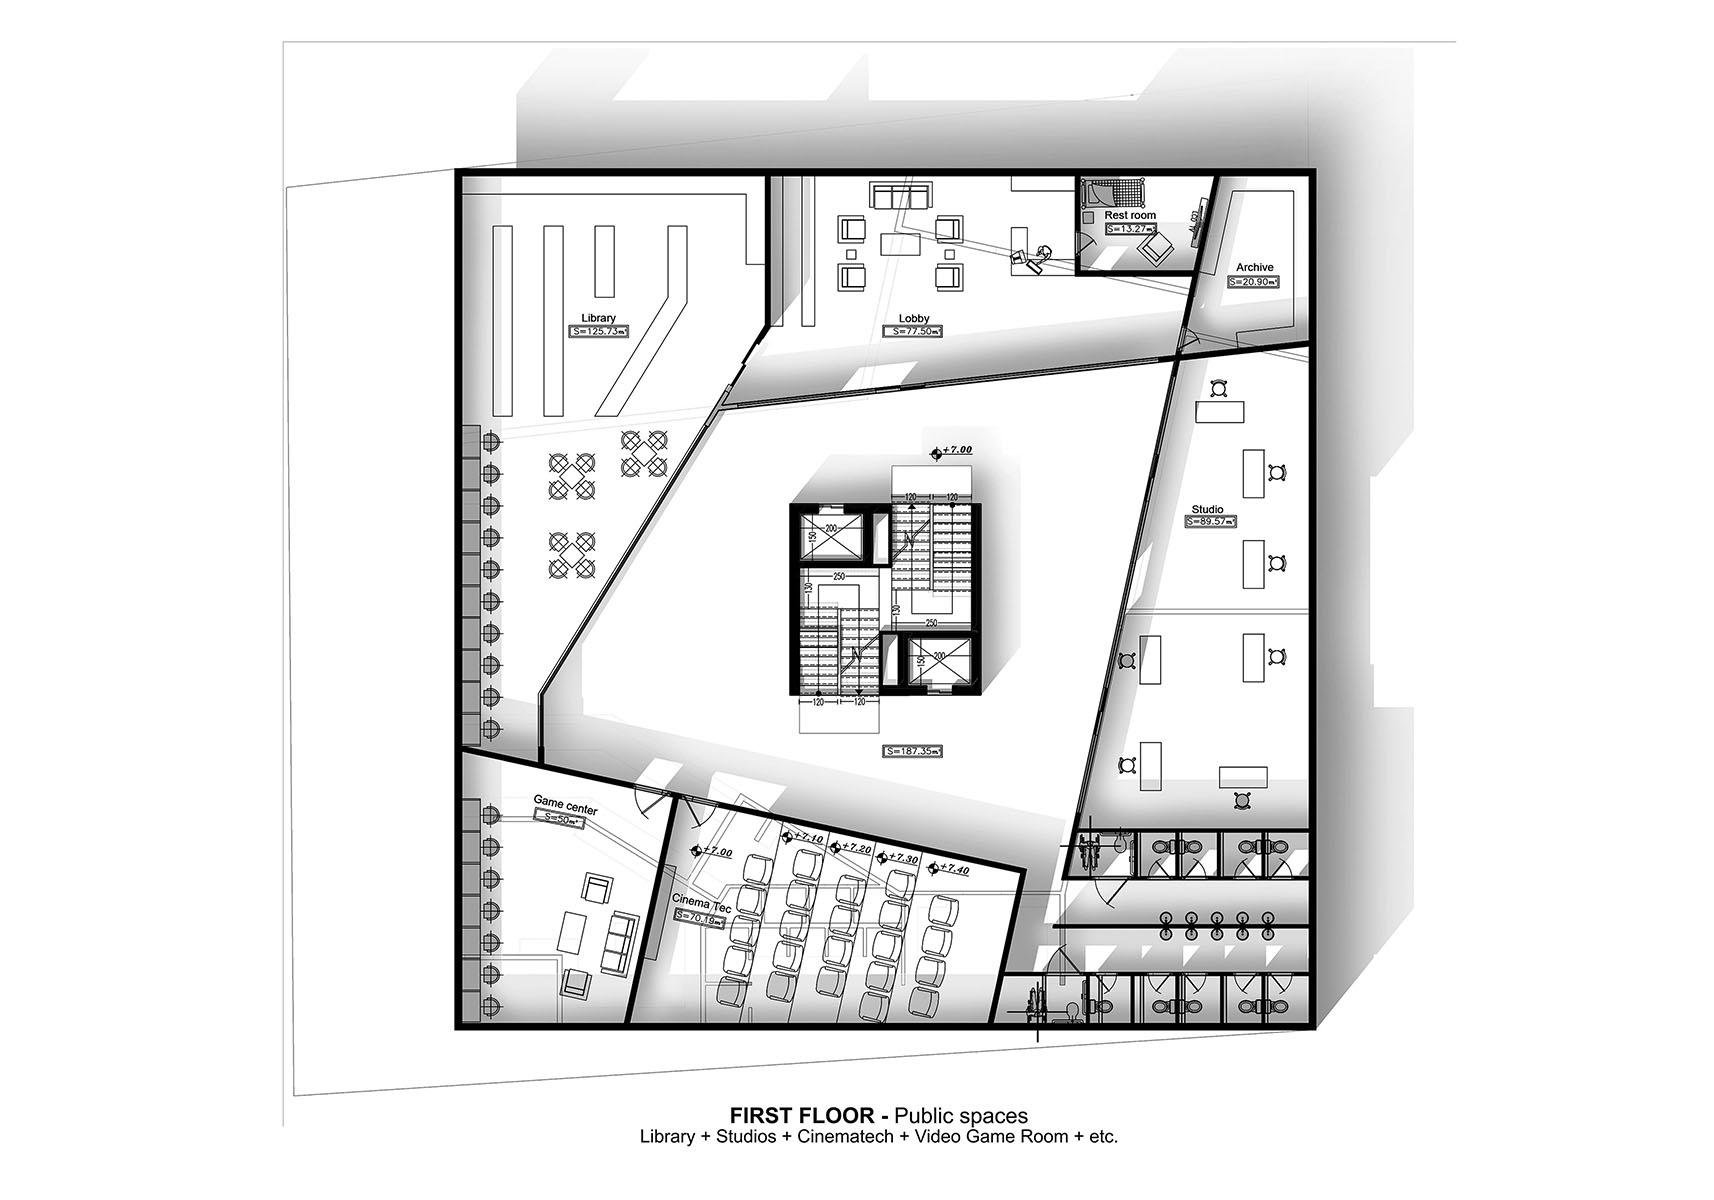 Genoa - A G Tehrani Design Studio - 07 - Section